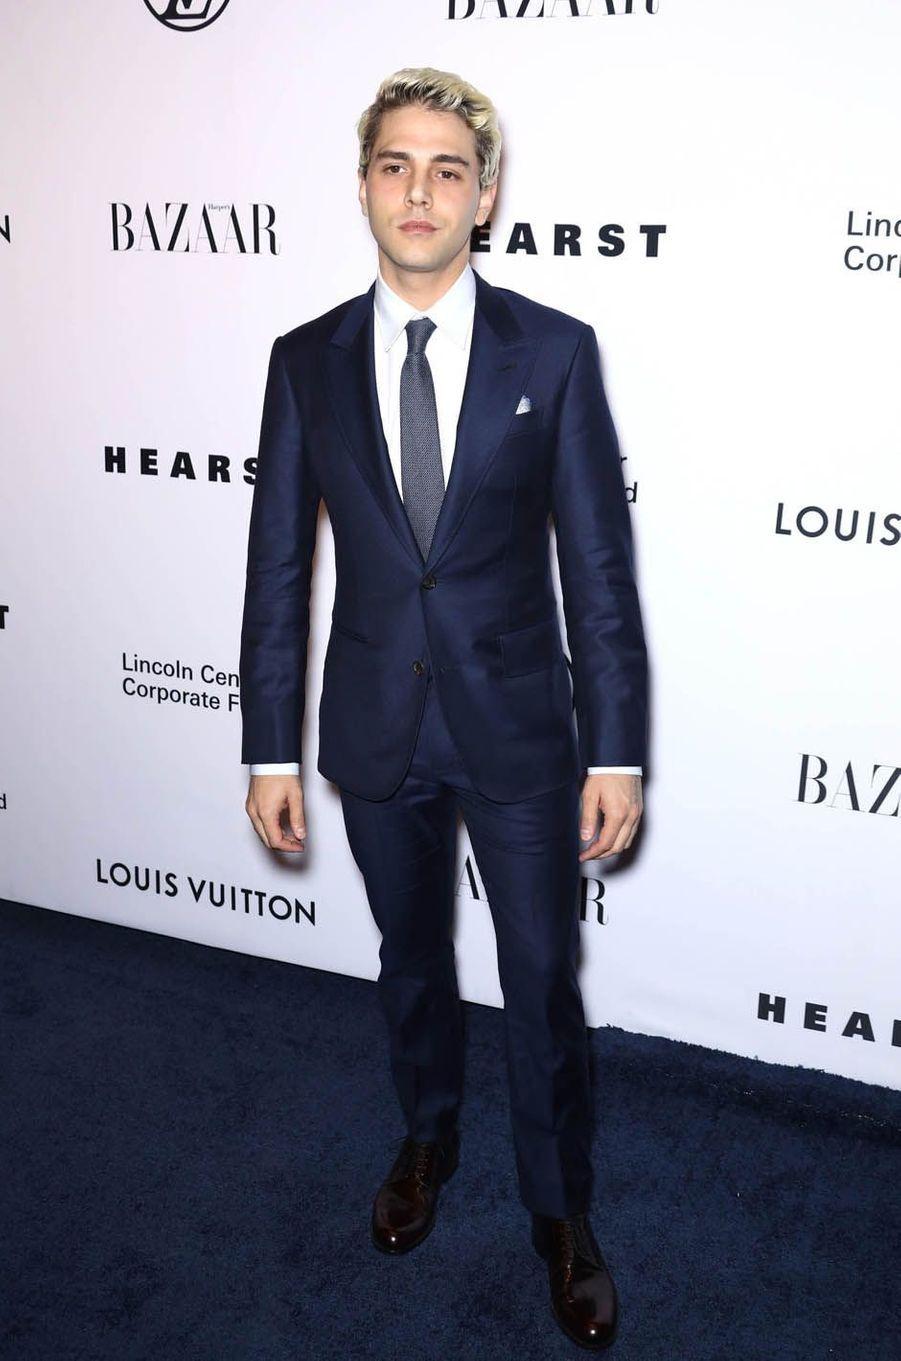 Xavier Dolanau gala de la fondation du Lincoln Center, le 30 novembre 2017 à New York.